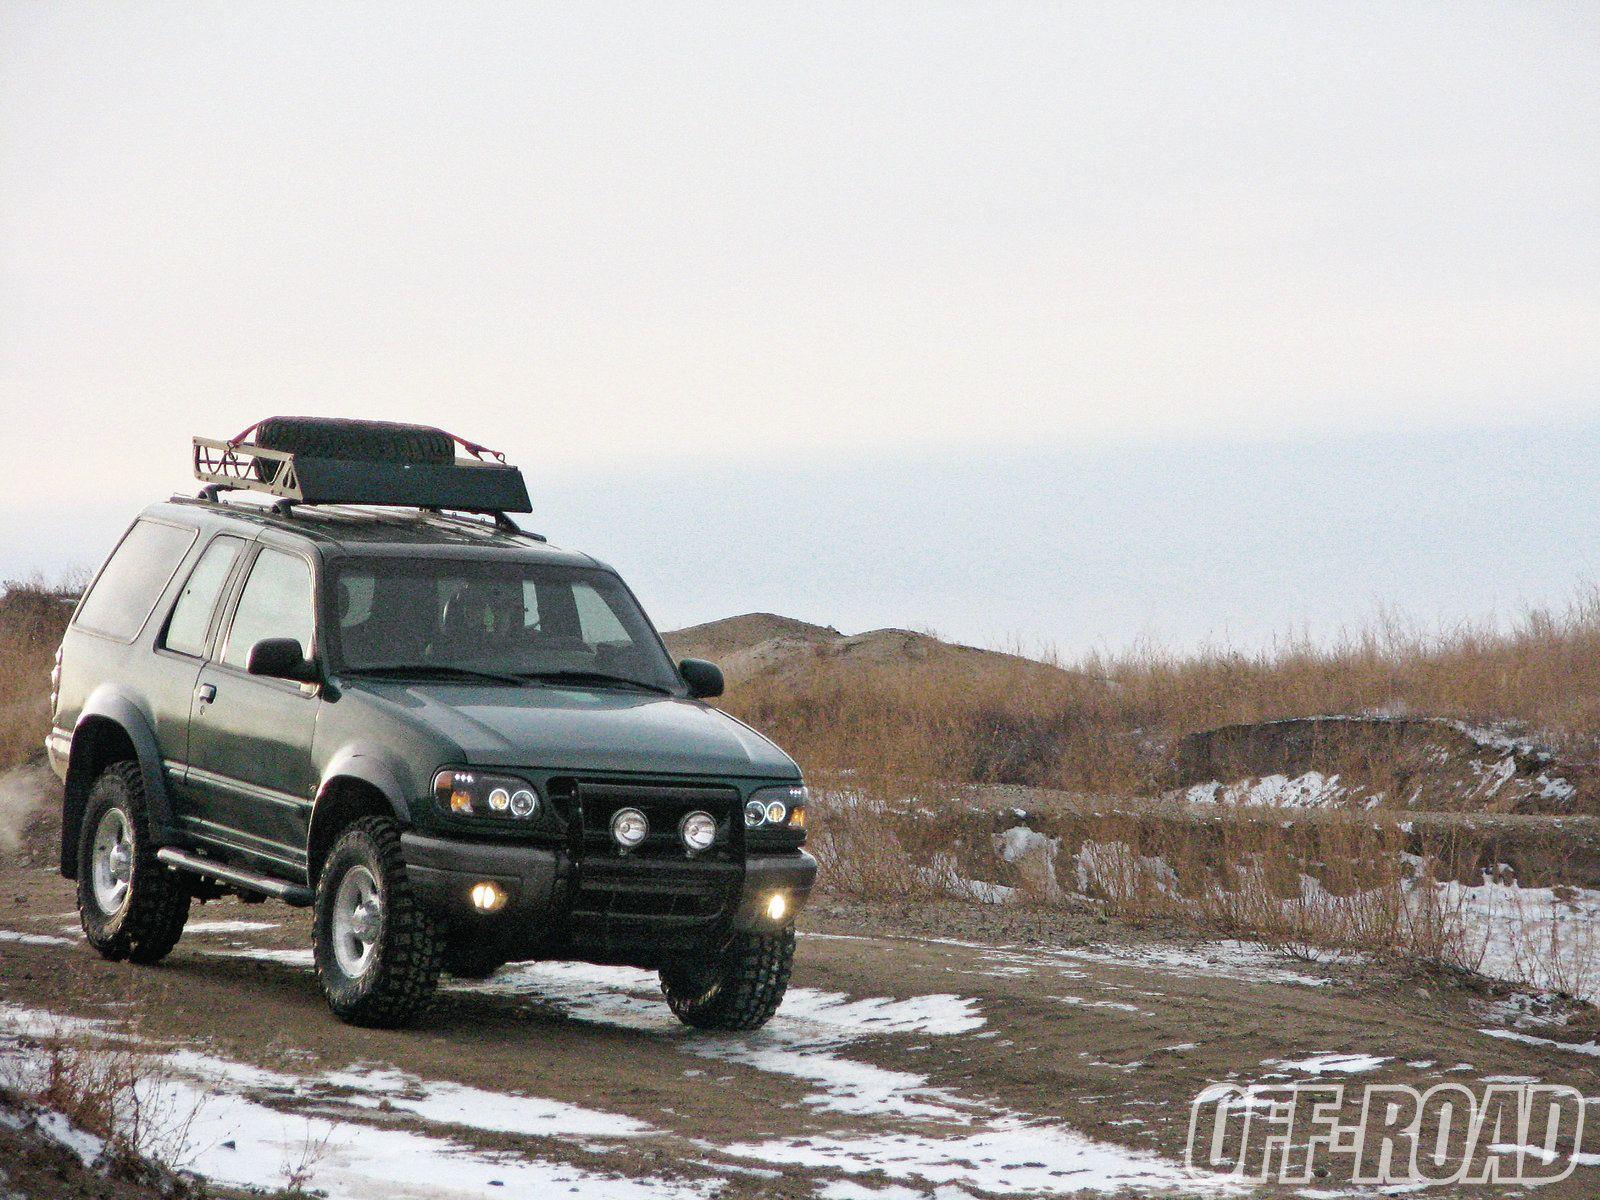 medium resolution of off road two door ford explorer